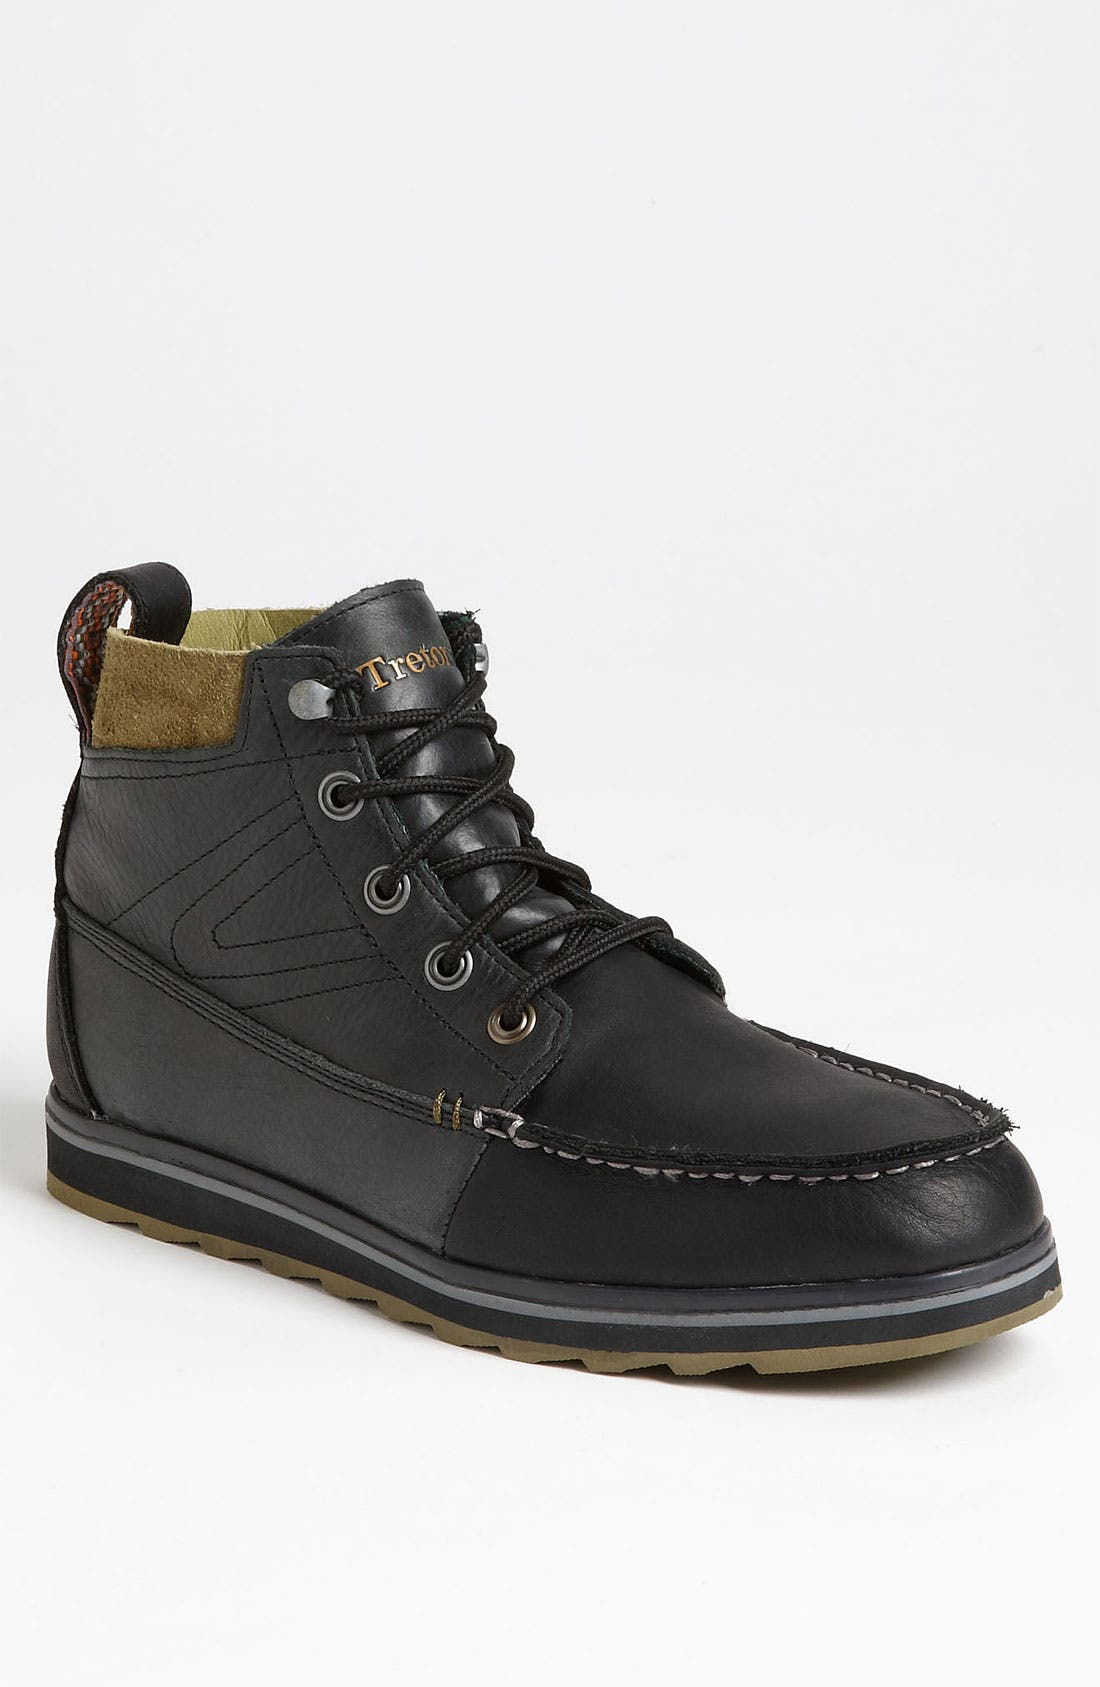 Main Image - Tretorn 'Holdyn' Moc Toe Boot